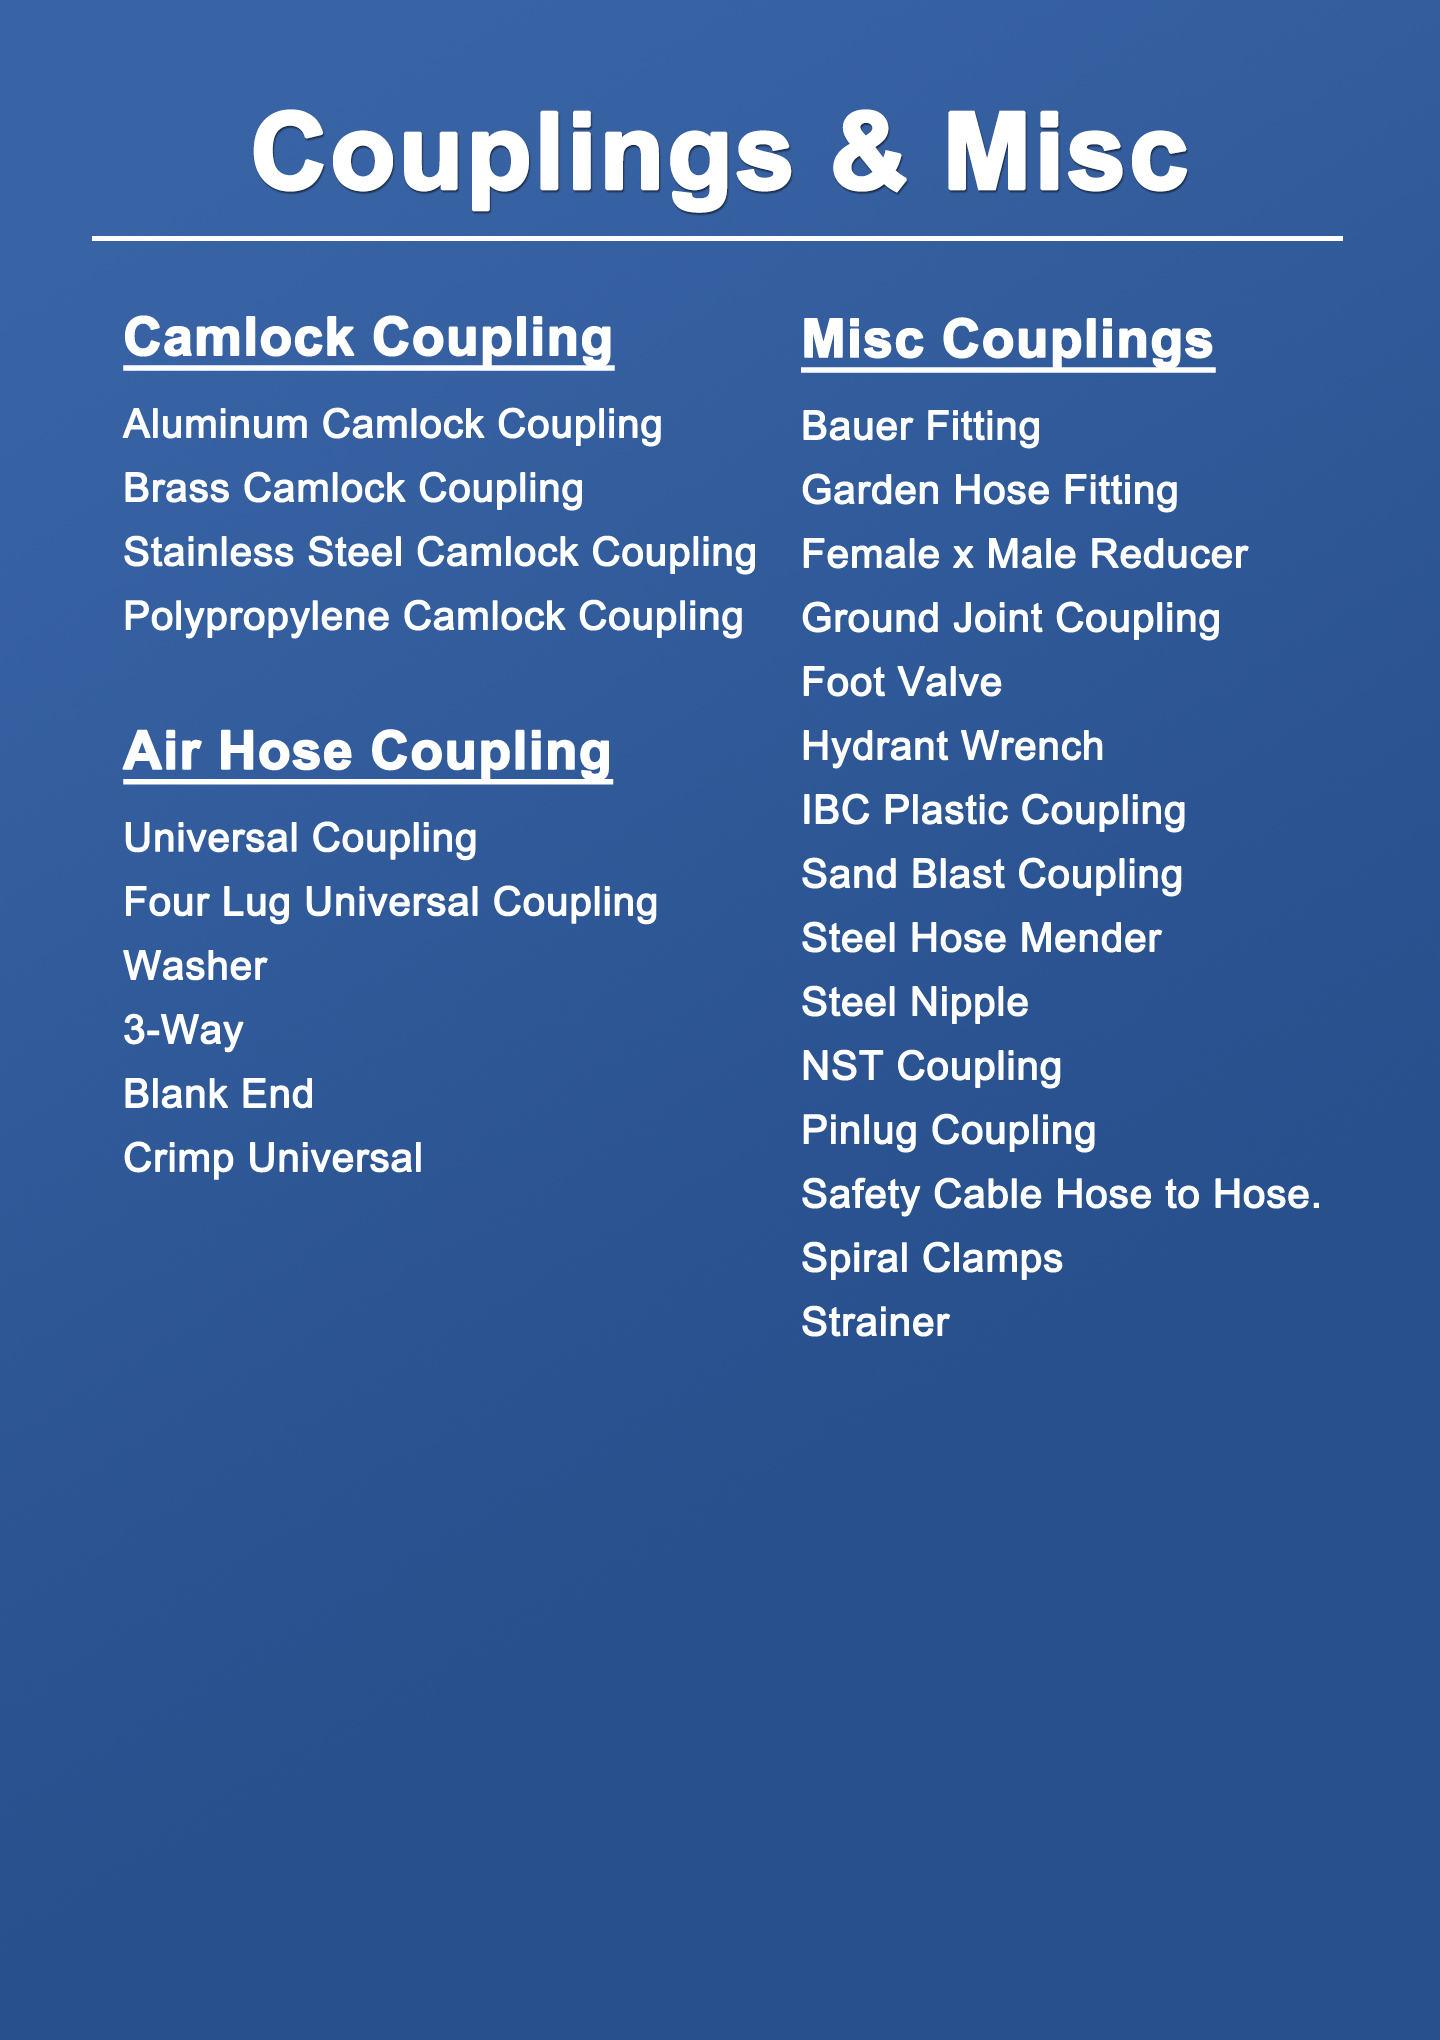 Couplings & Misc Datasheet